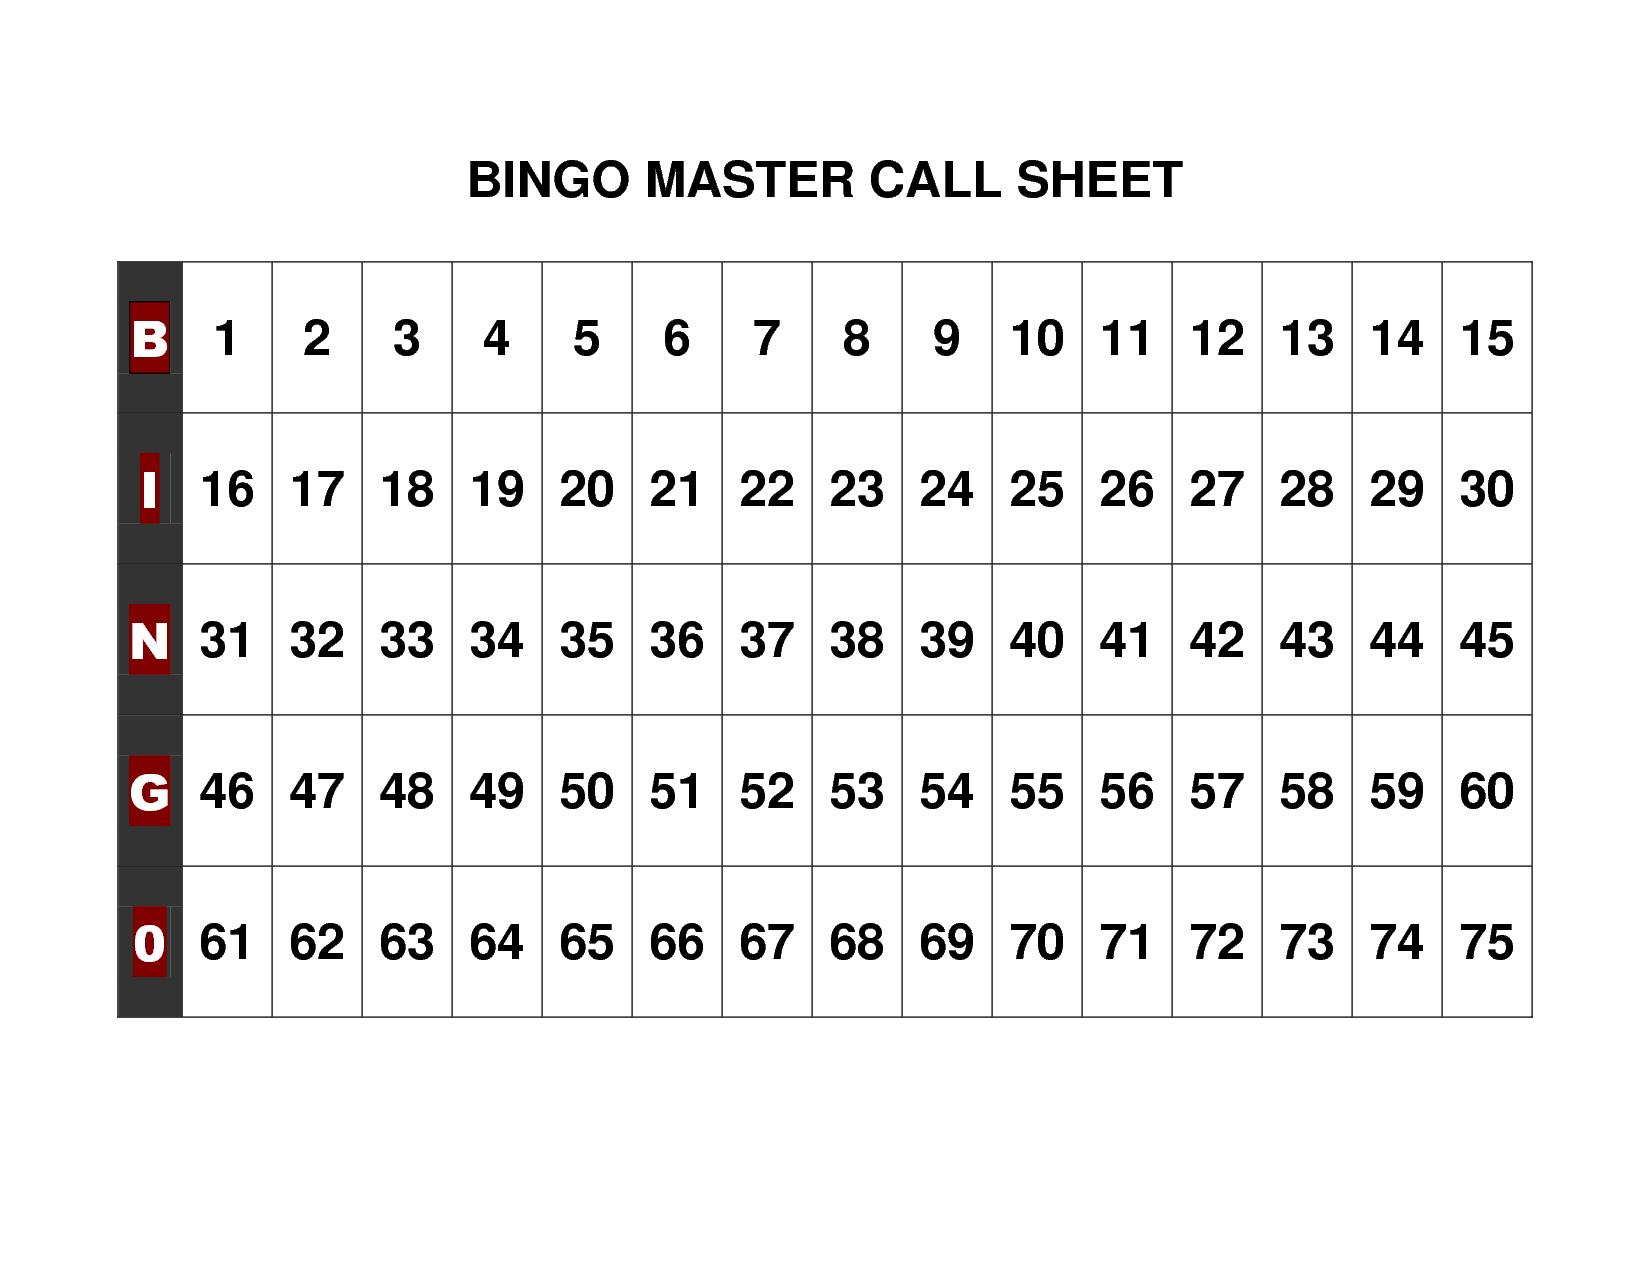 Free+Printable+Bingo+Call+Sheet | Bingo | Pinterest | Bingo, Bingo - Free Printable Bingo Cards 1 100